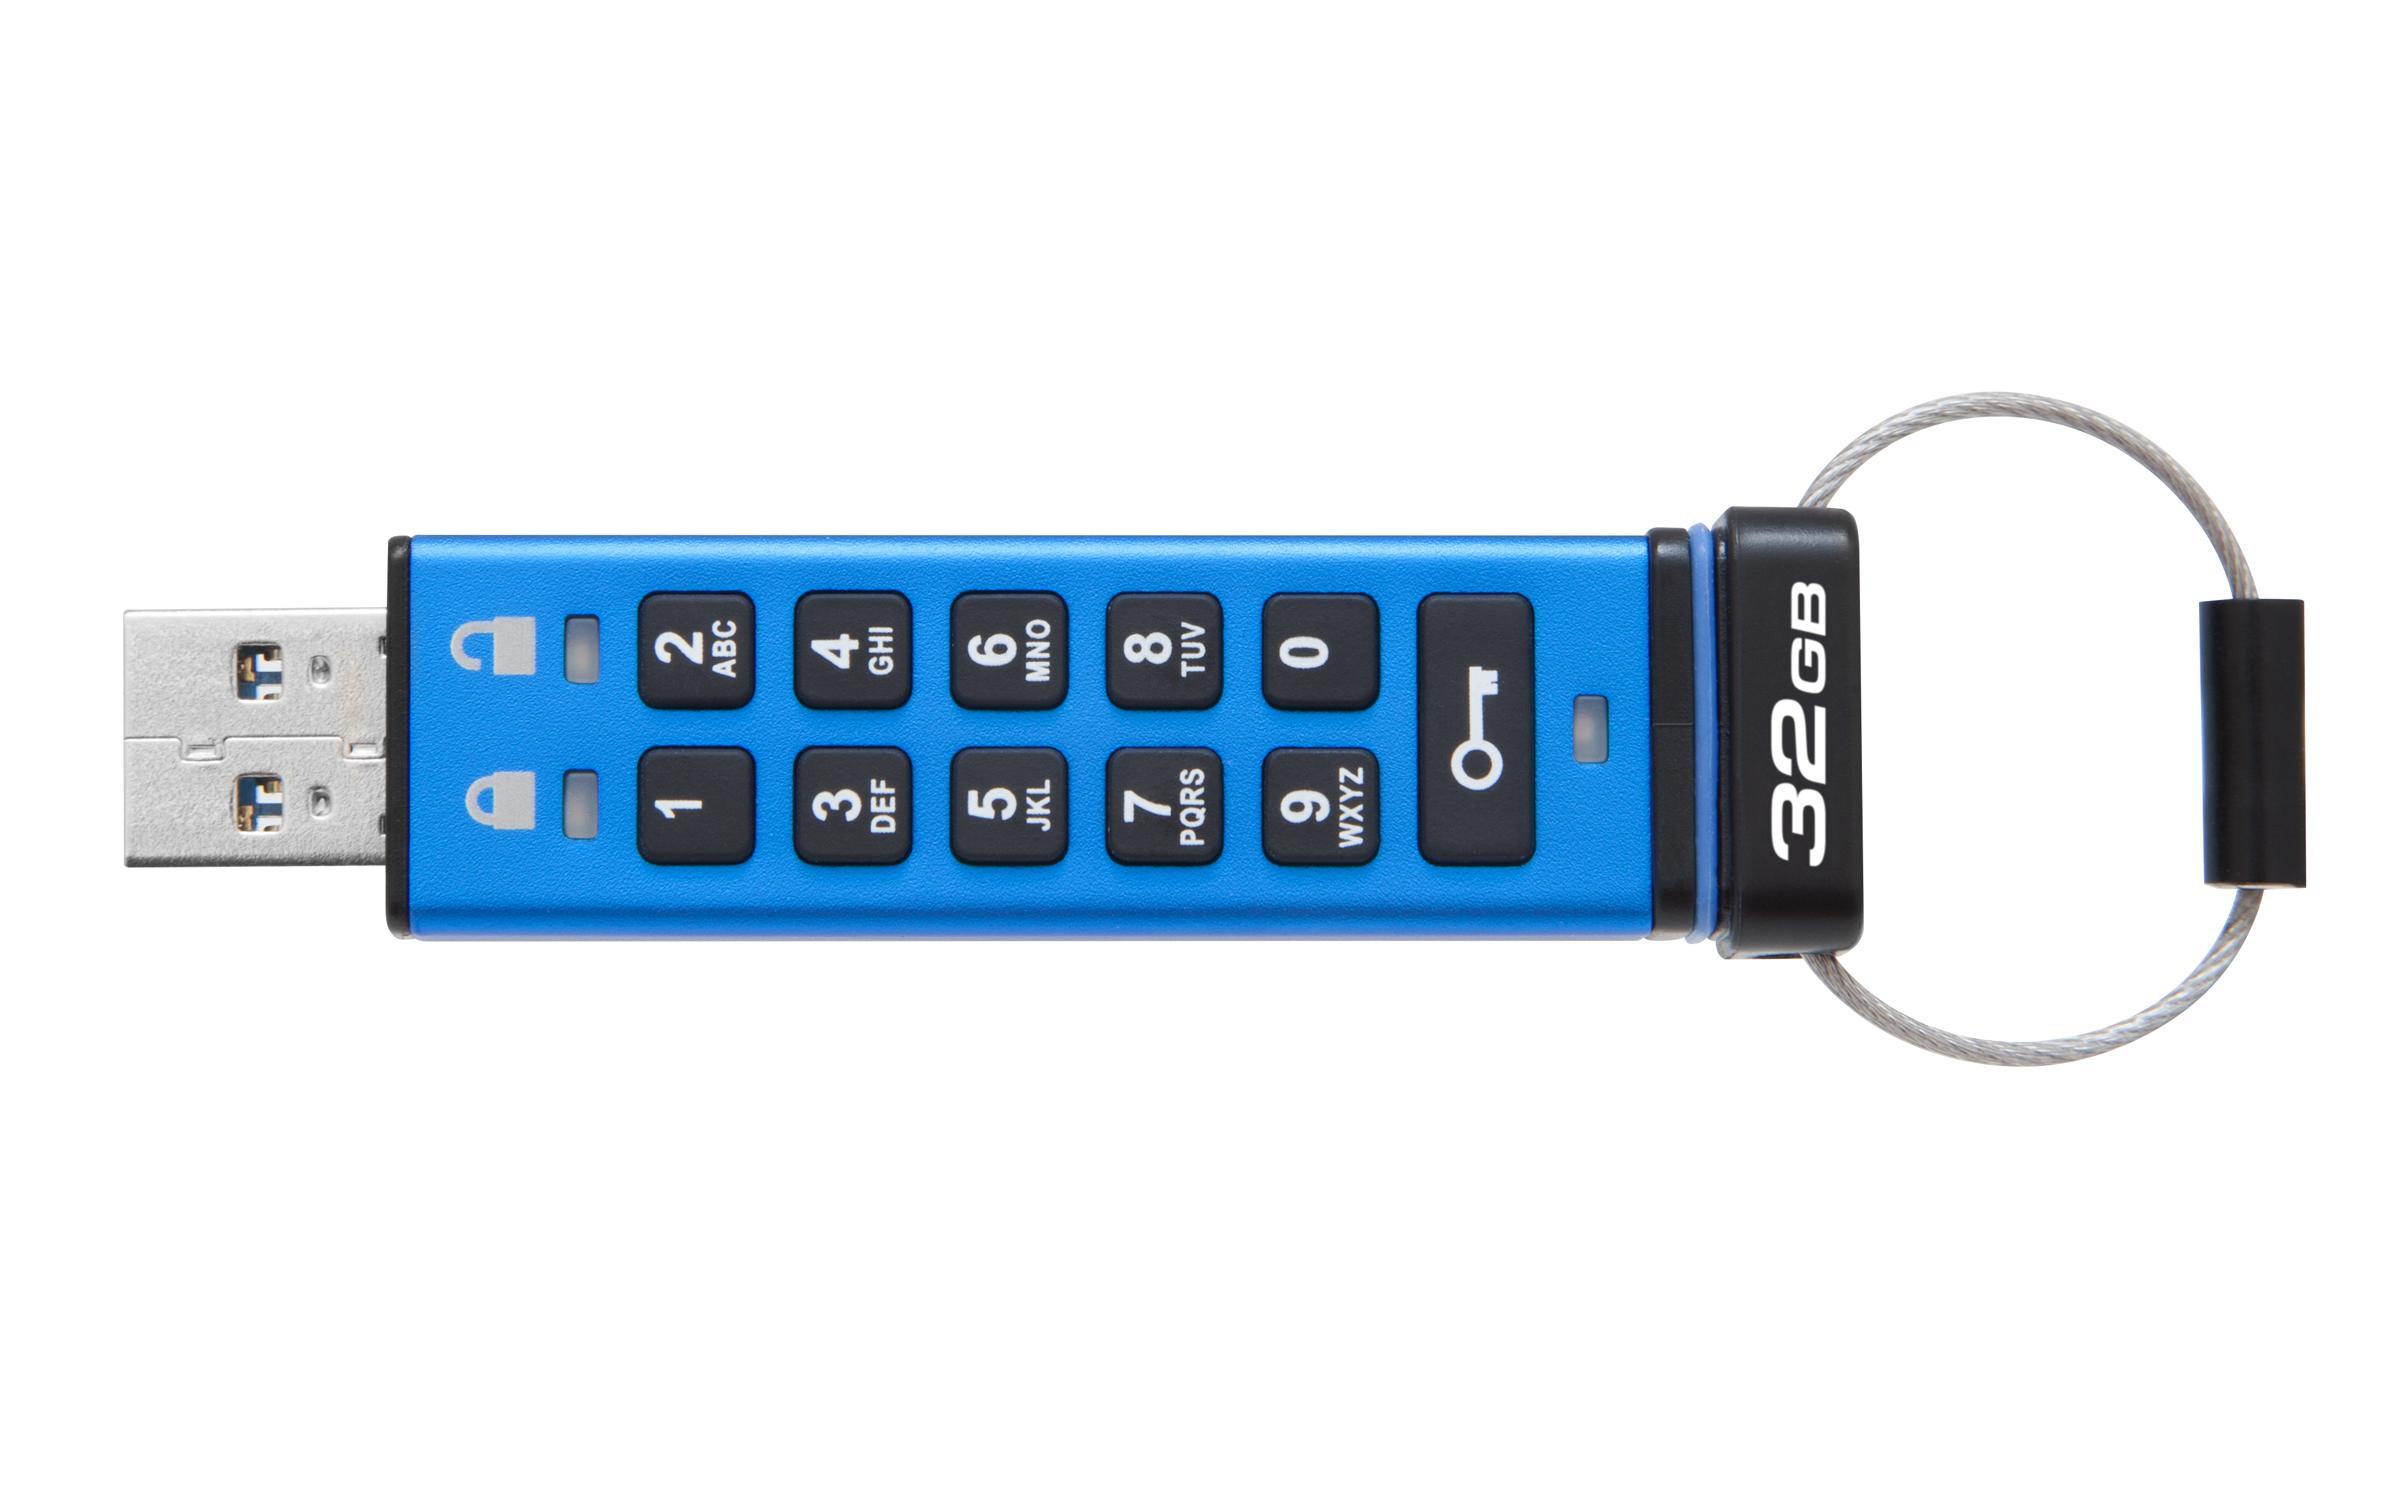 USB памет KINGSTON DataTraveler 2000, 32GB, USB 3.1, хардуерно криптиране, Син